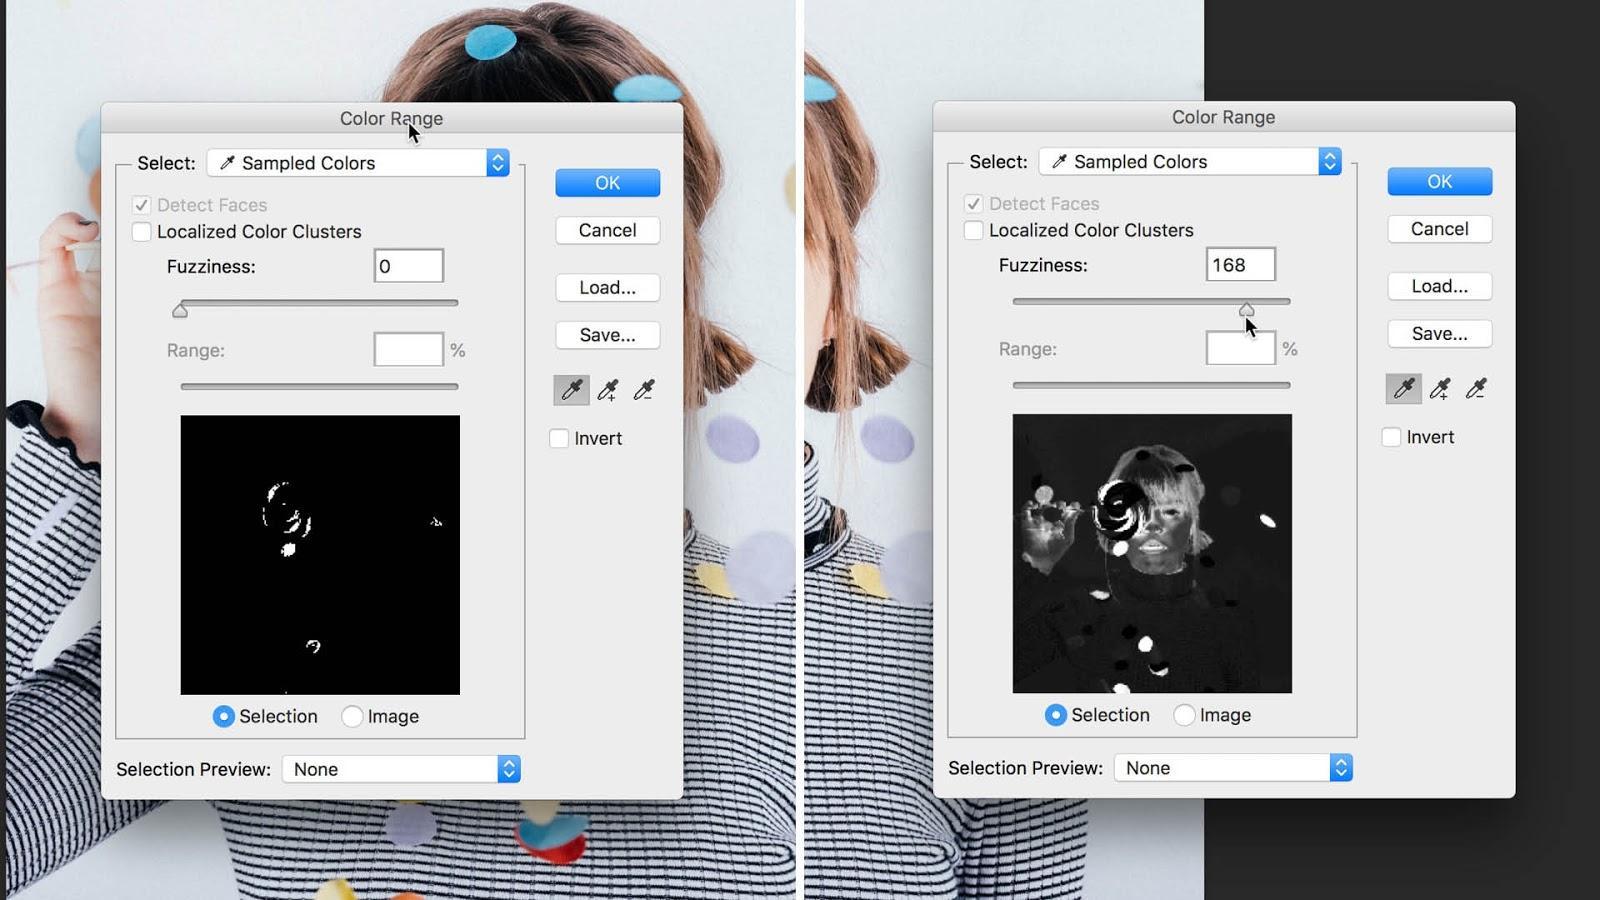 fuziness slider in Photoshop